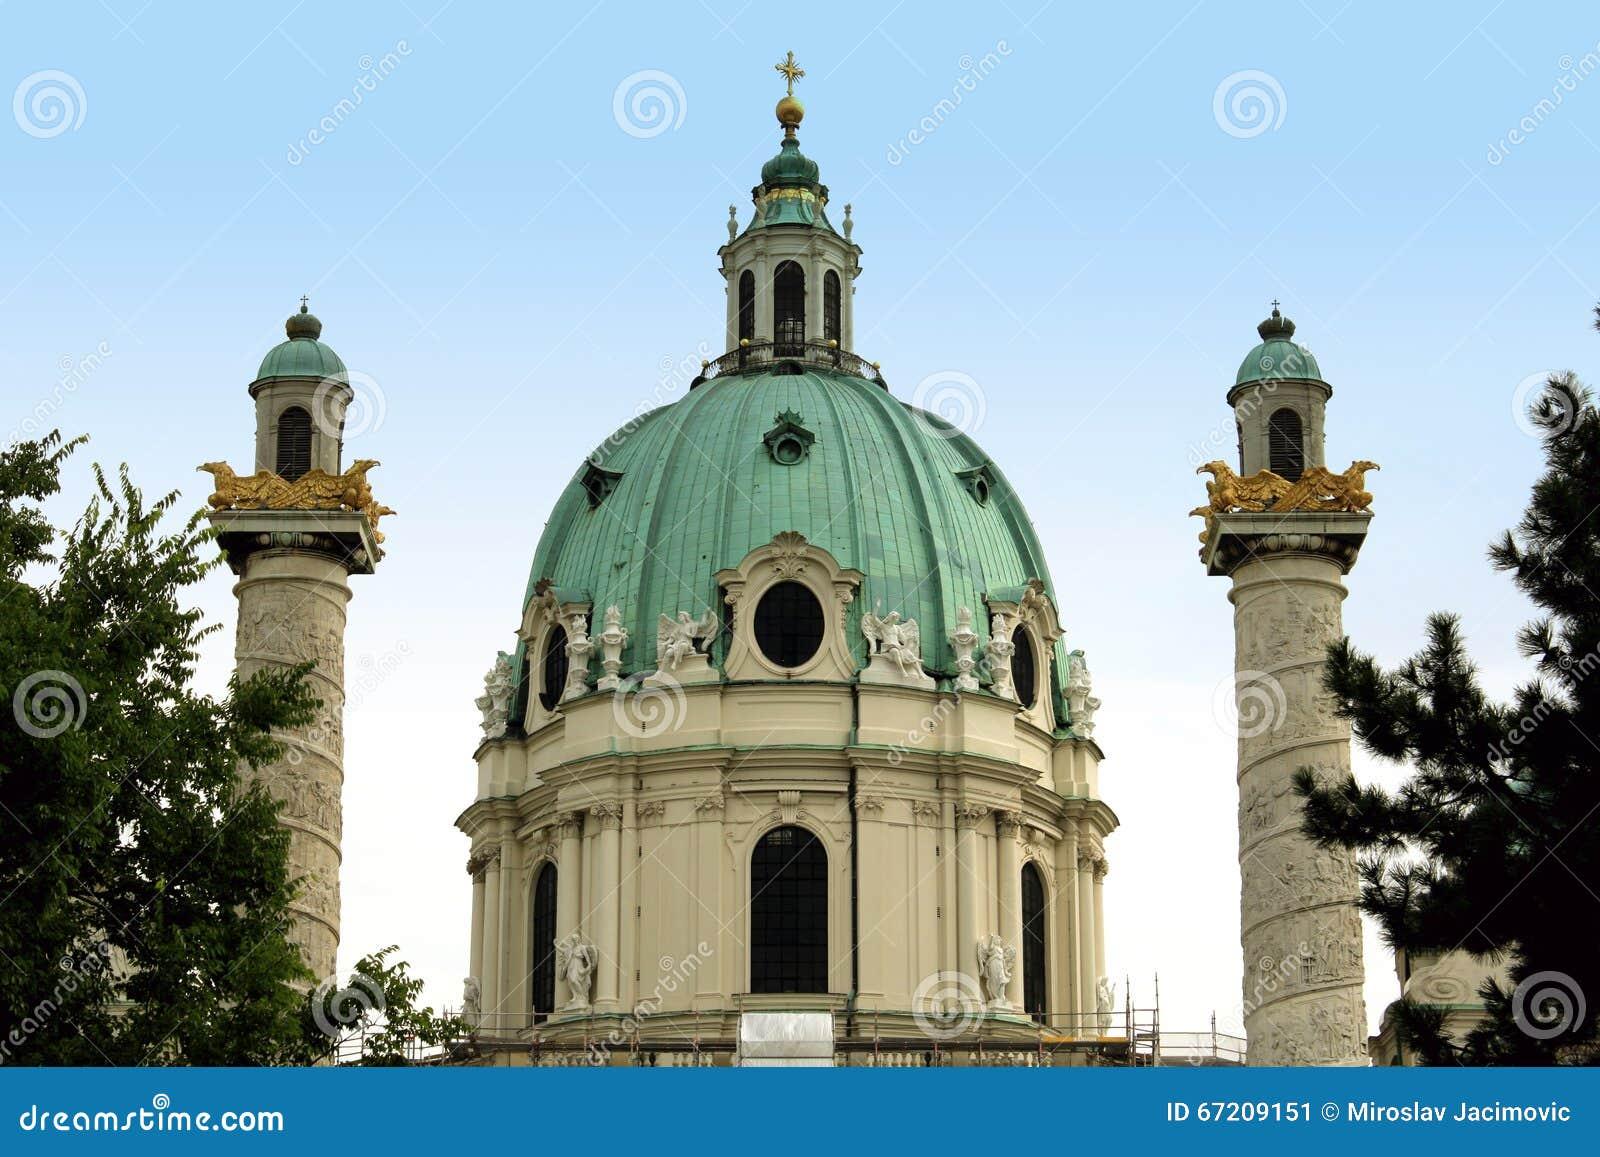 St. Charles s Church (Karlskirche) in Vienna, Austria at sunrise